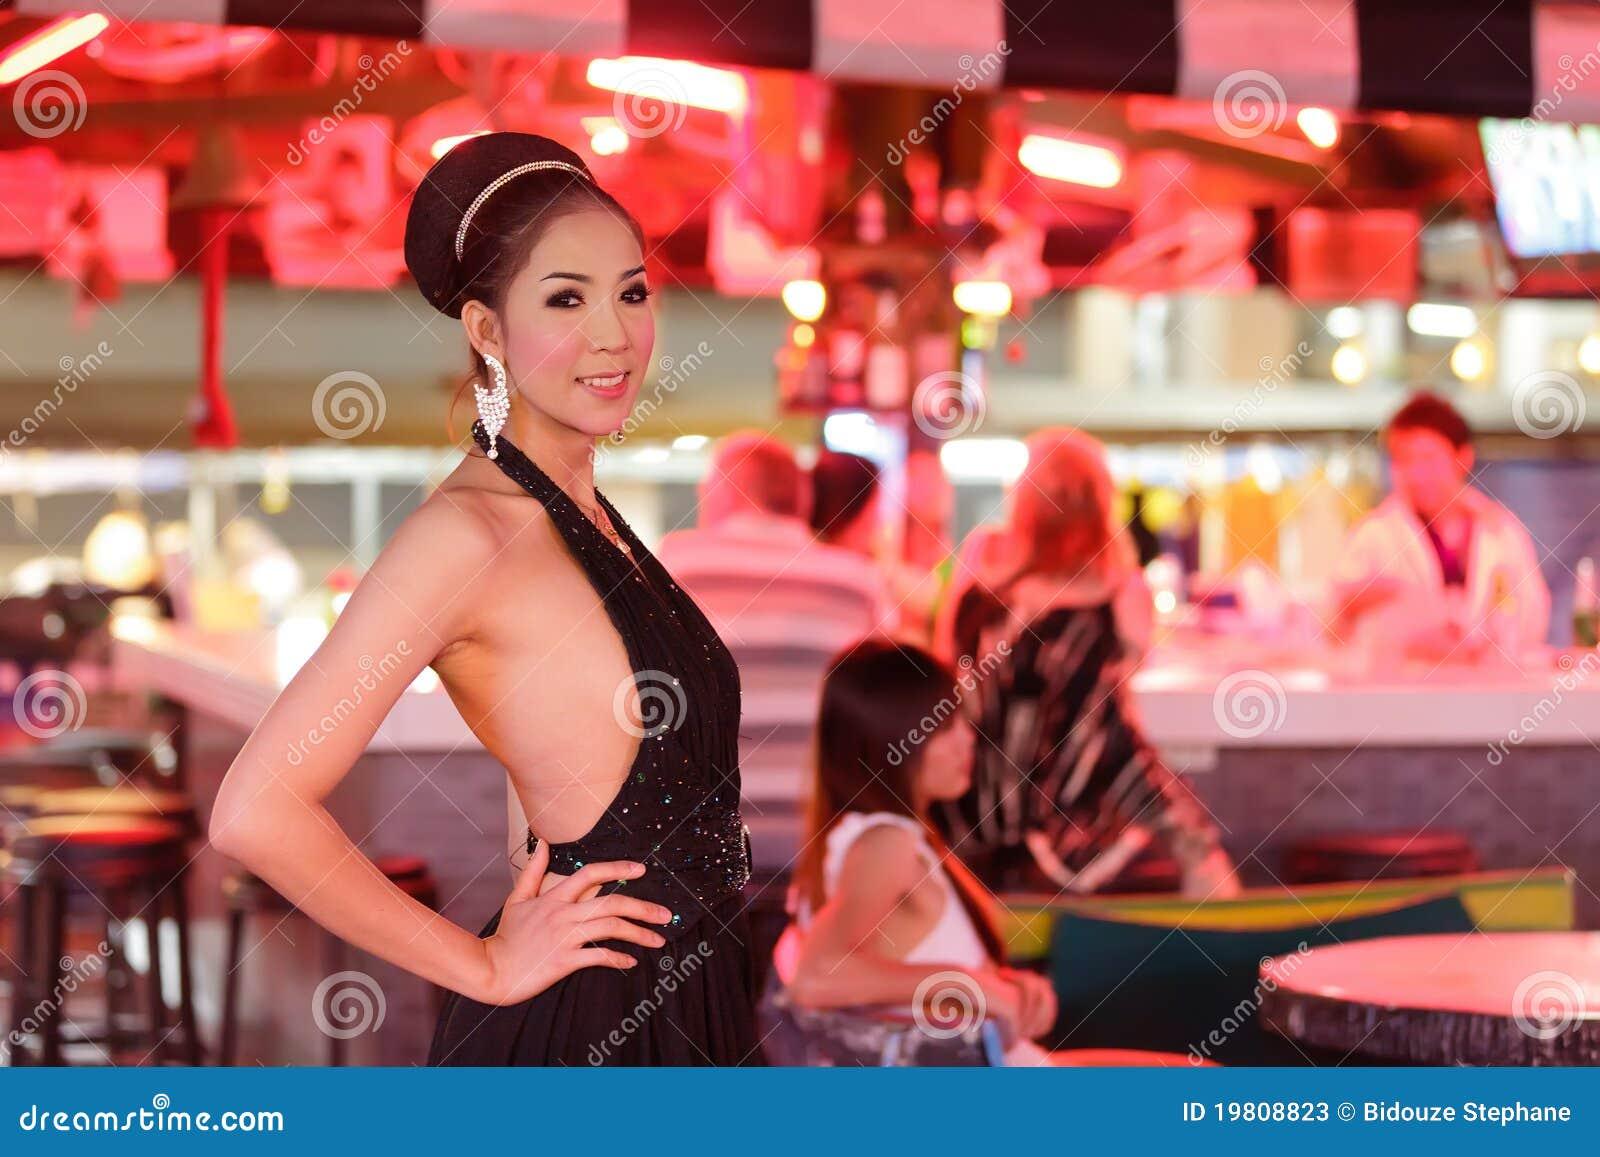 shemale shemale thai ladyboy